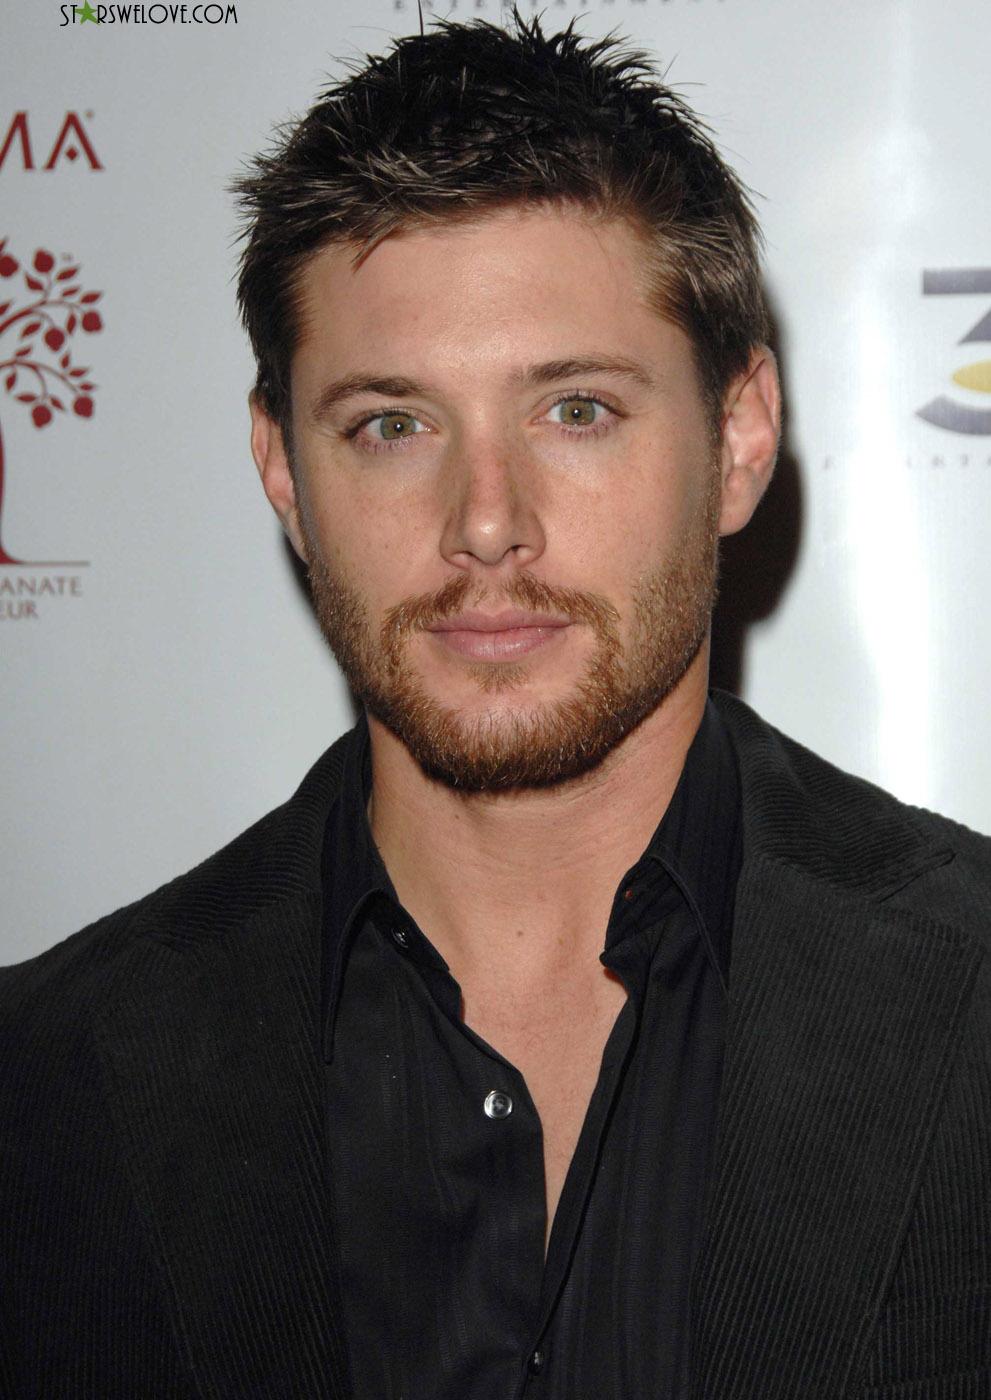 Collection Of Beard Styles Jensen Ackles Beard Styles